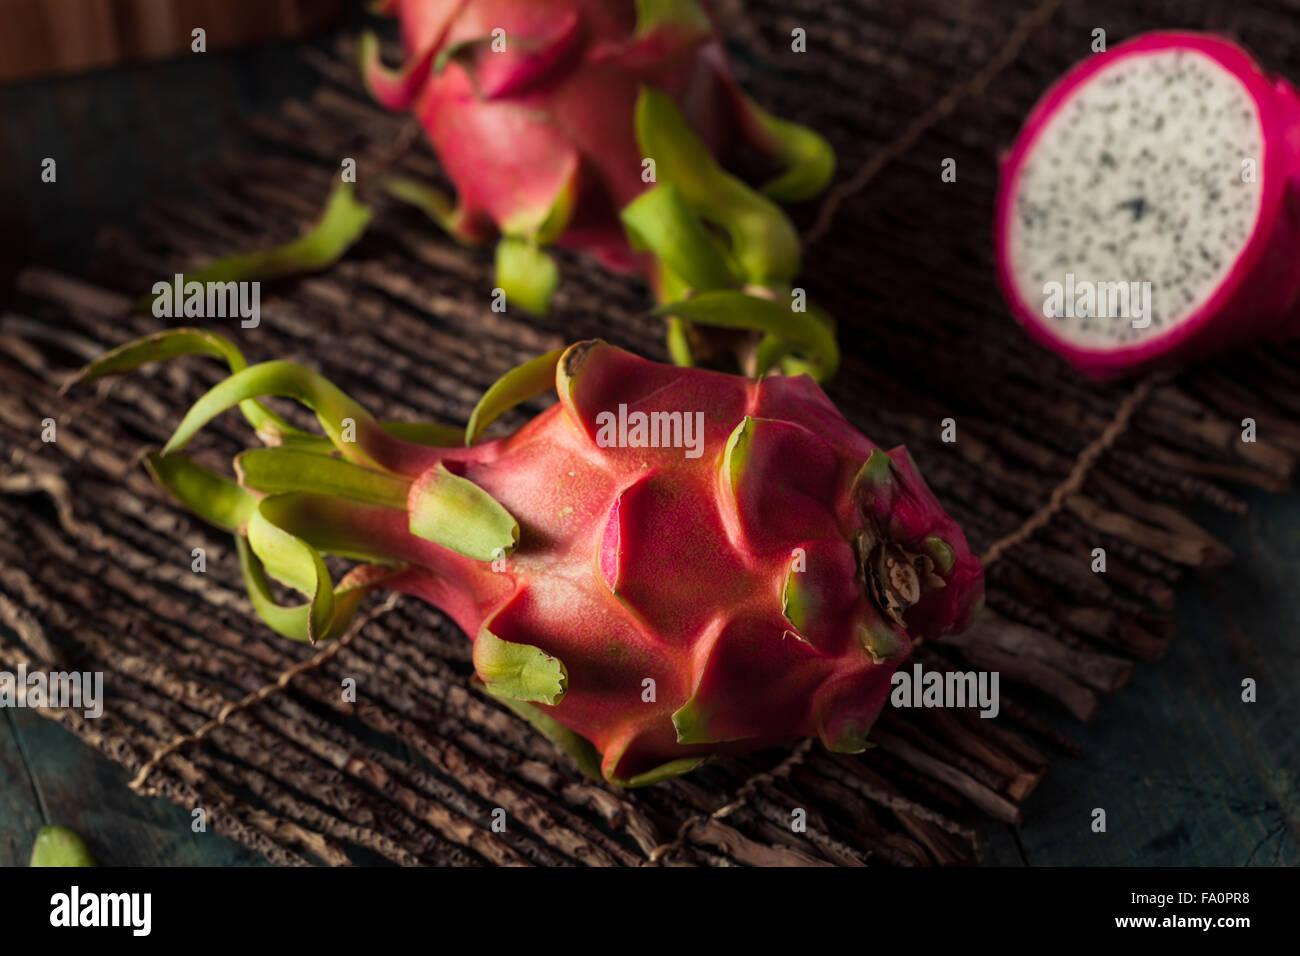 Rawanic Dragon Fruit Ready To Eat Stock Photo, Royalty Free